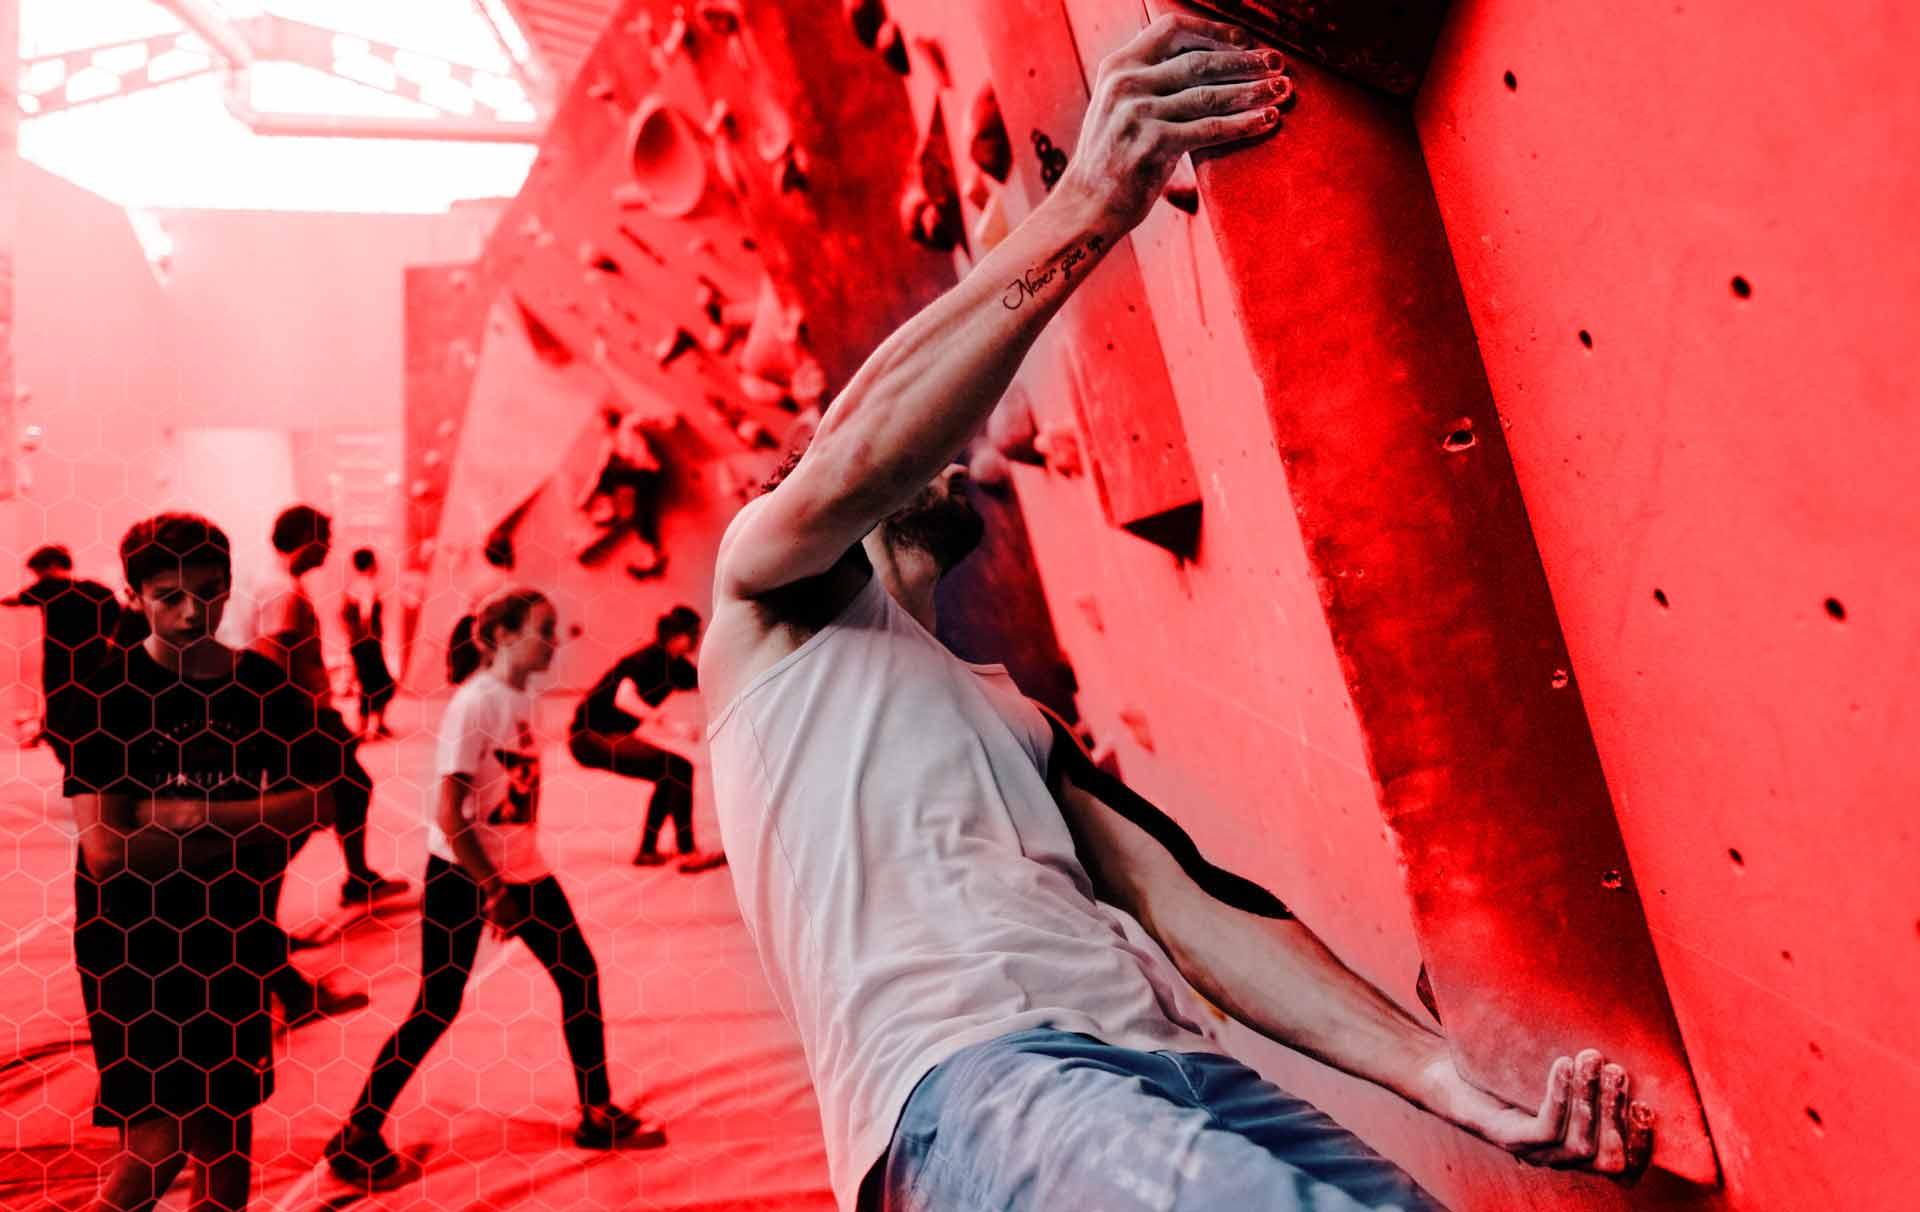 chausson d'escalade pour location neo gym